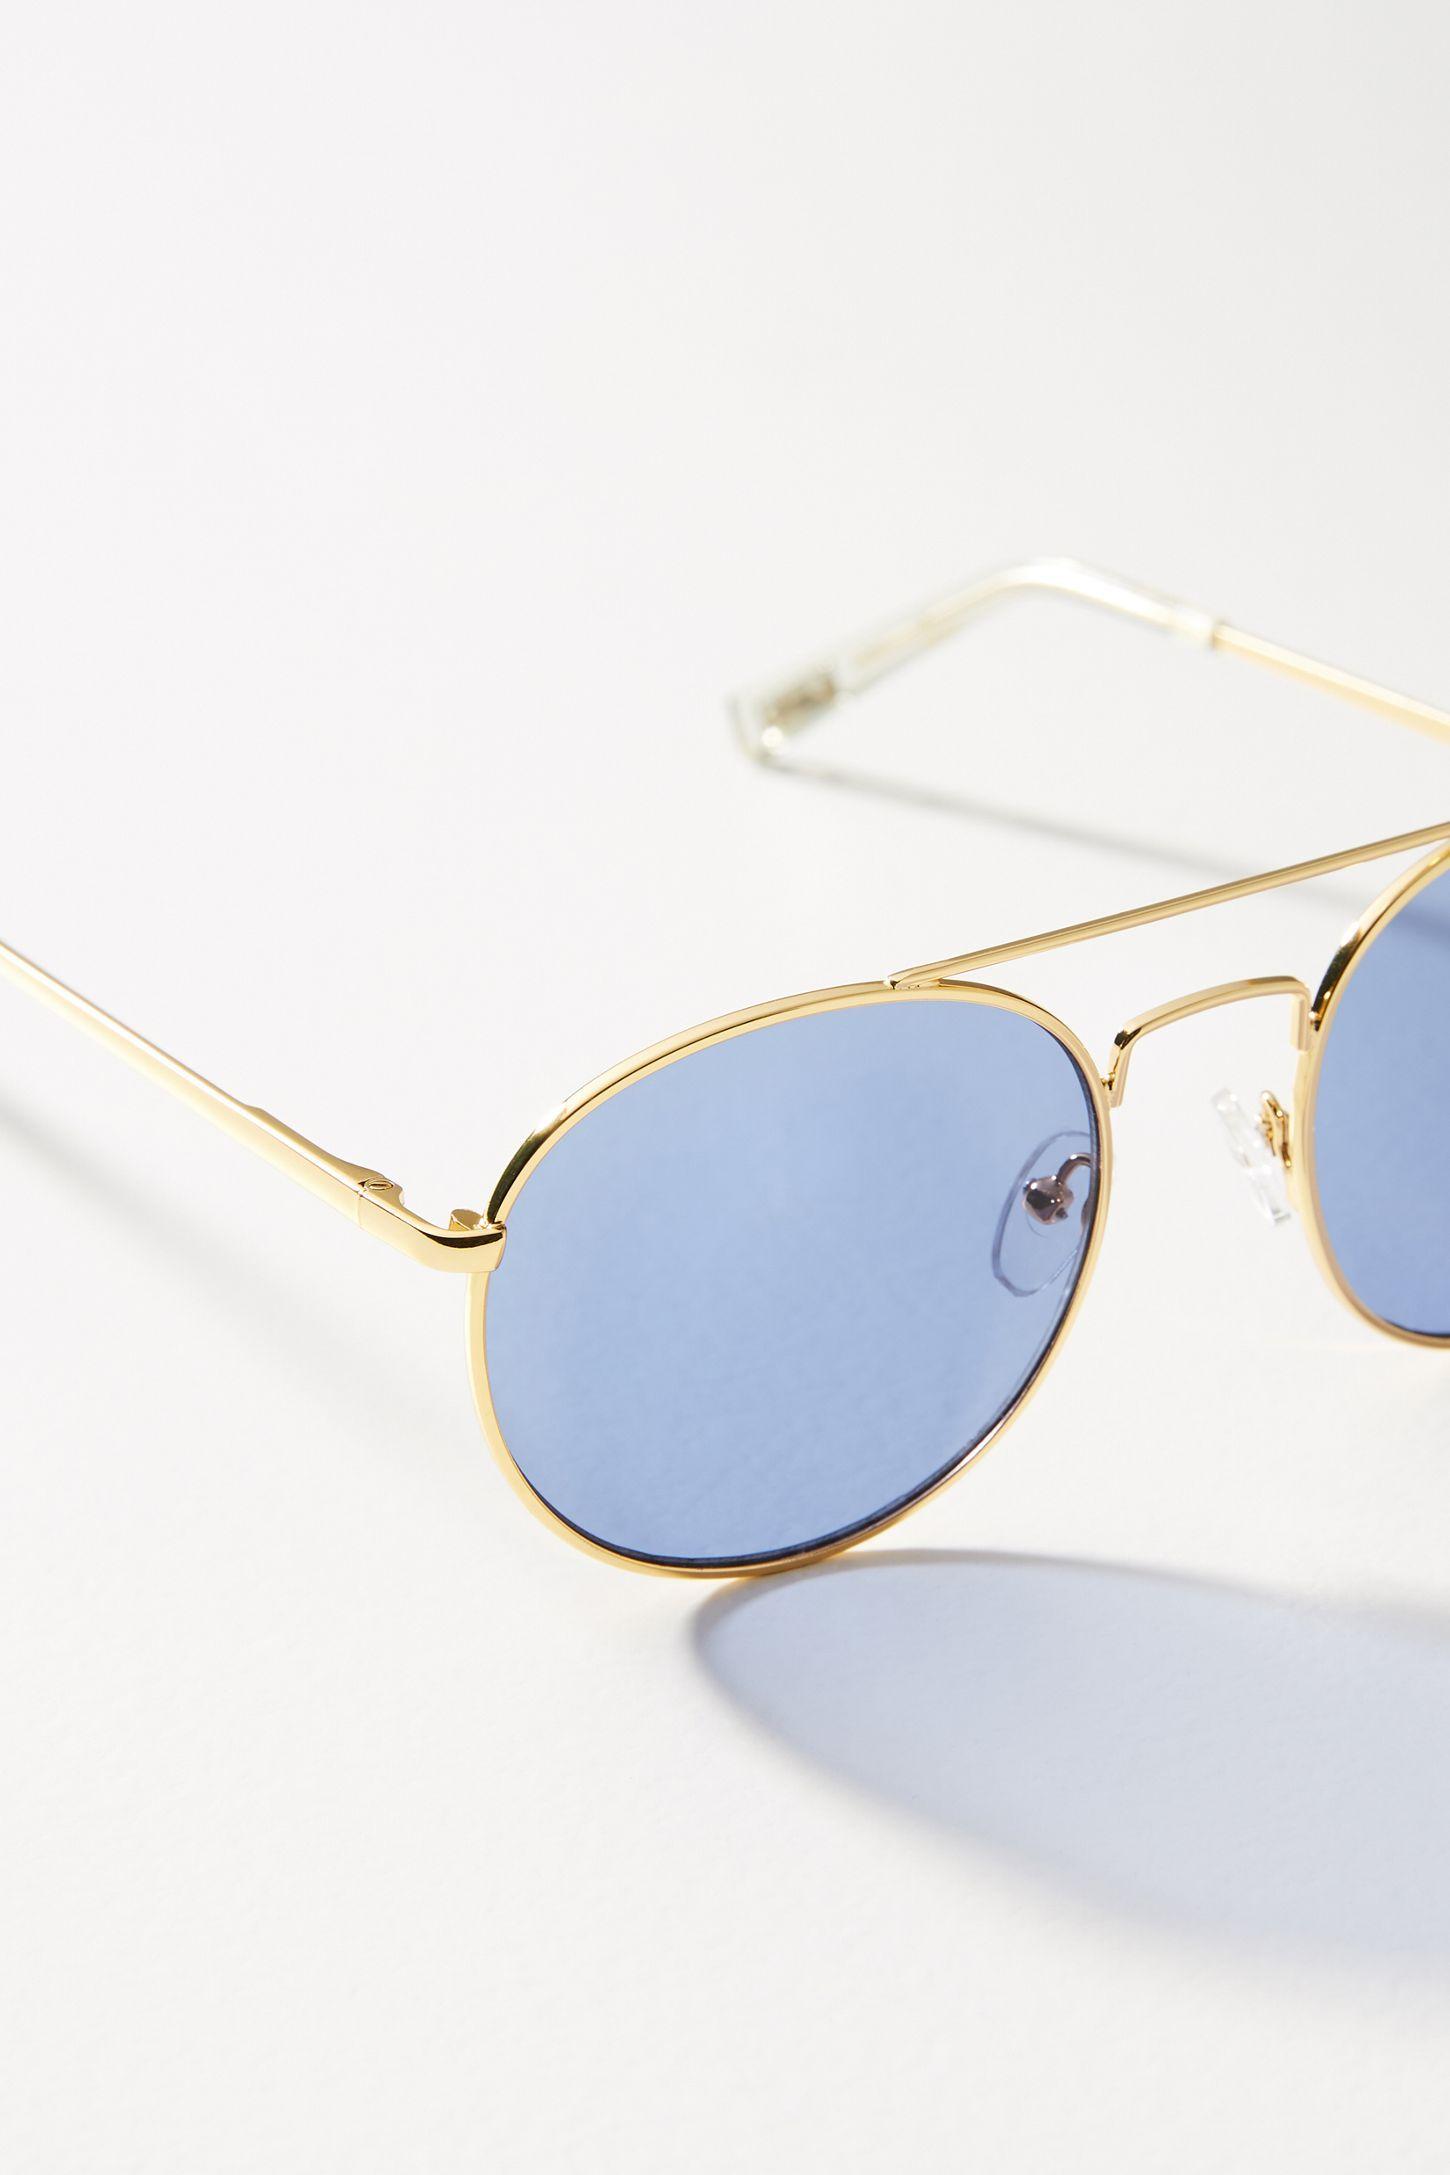 Le Specs Revolution Sunglasses Sunglasses, Le specs, Specs